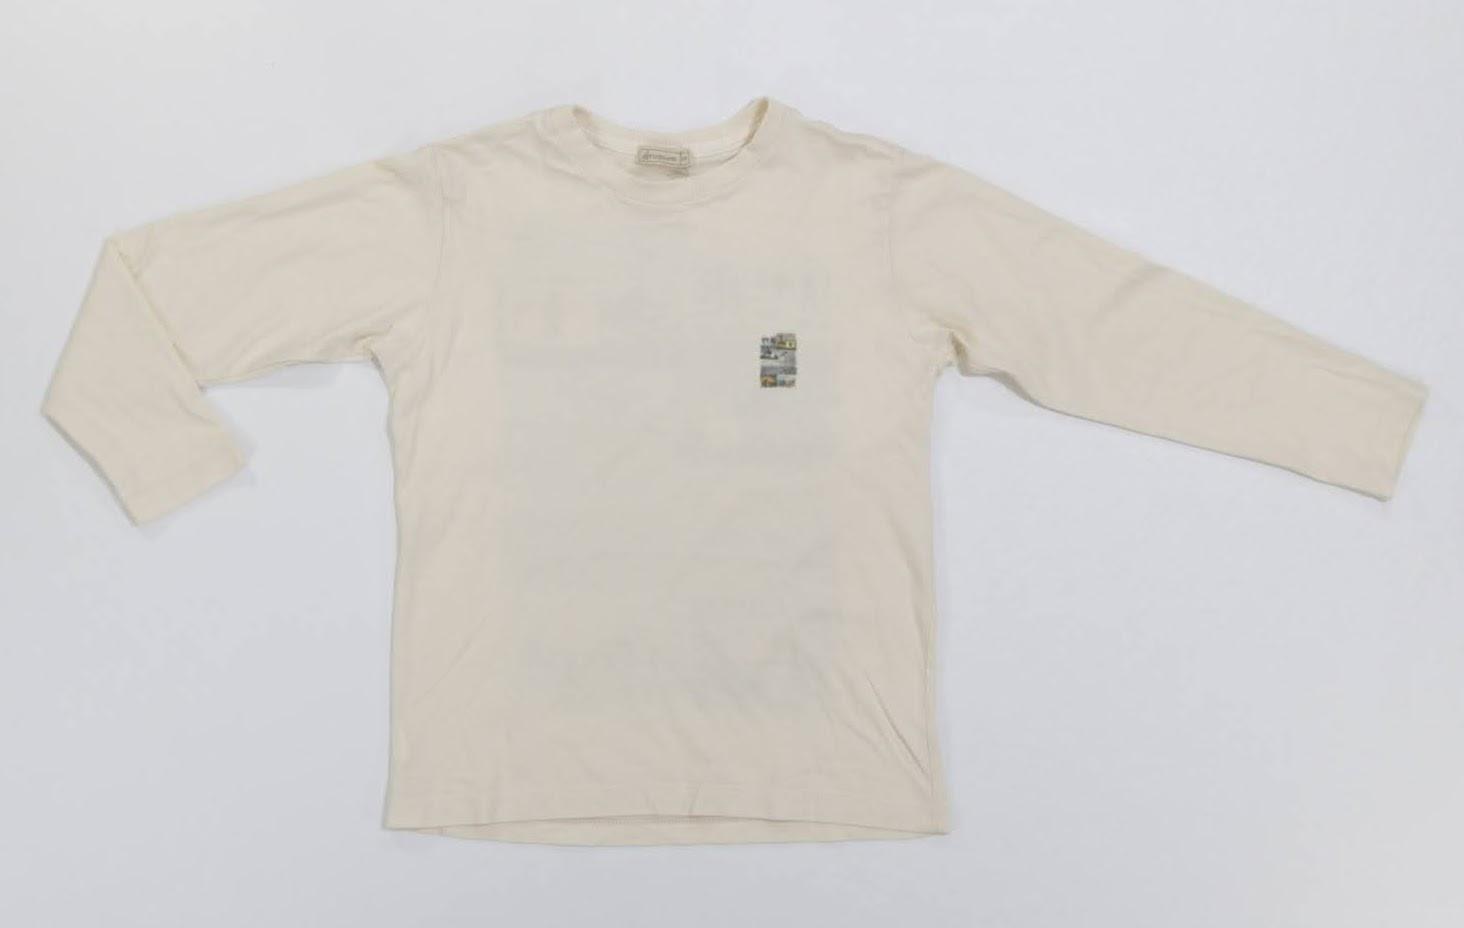 Camiseta Arcobaleno- Tam 08 anos